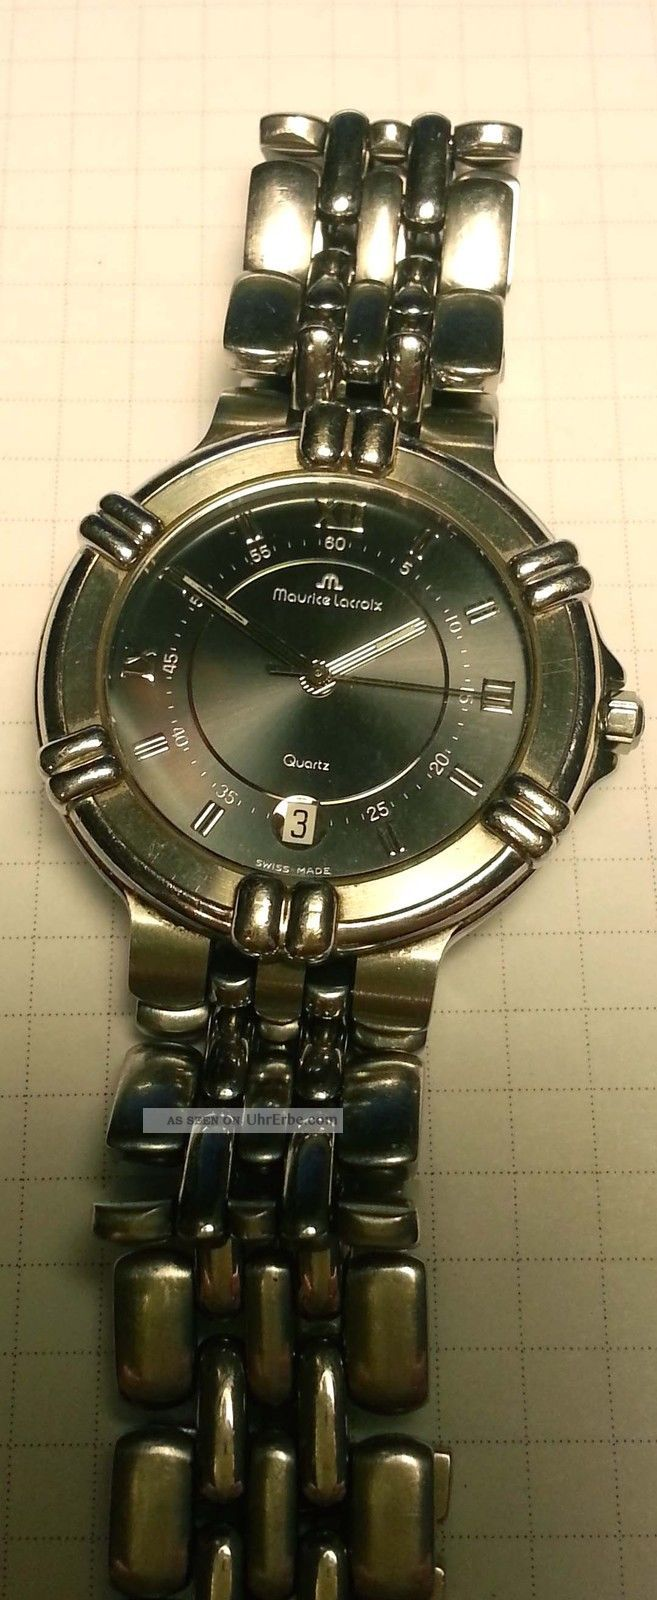 Maurice Lacroix Calypso Edelstahl Mit Edelstahlband Armbanduhren Bild